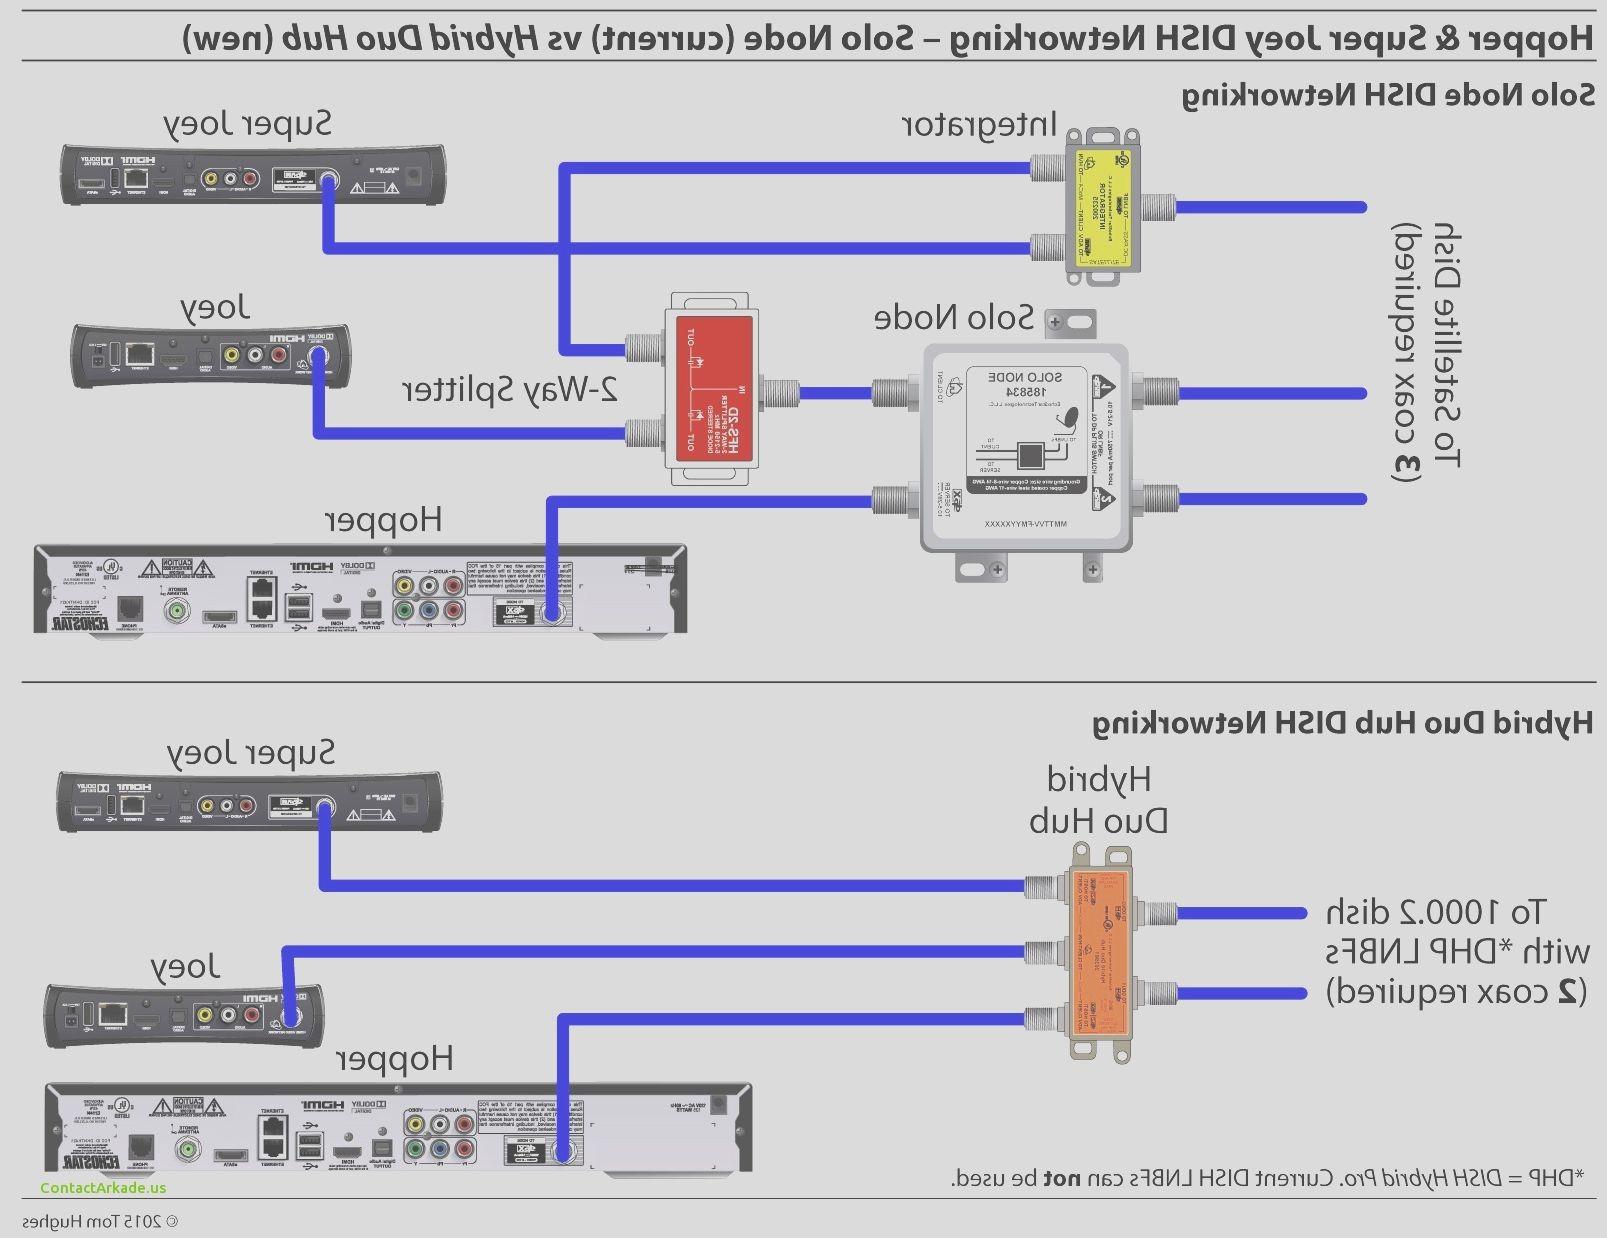 hight resolution of dish vip722 wiring basic electronics wiring diagramdish vip722 wiring online wiring diagramdish vip 612 wiring diagram